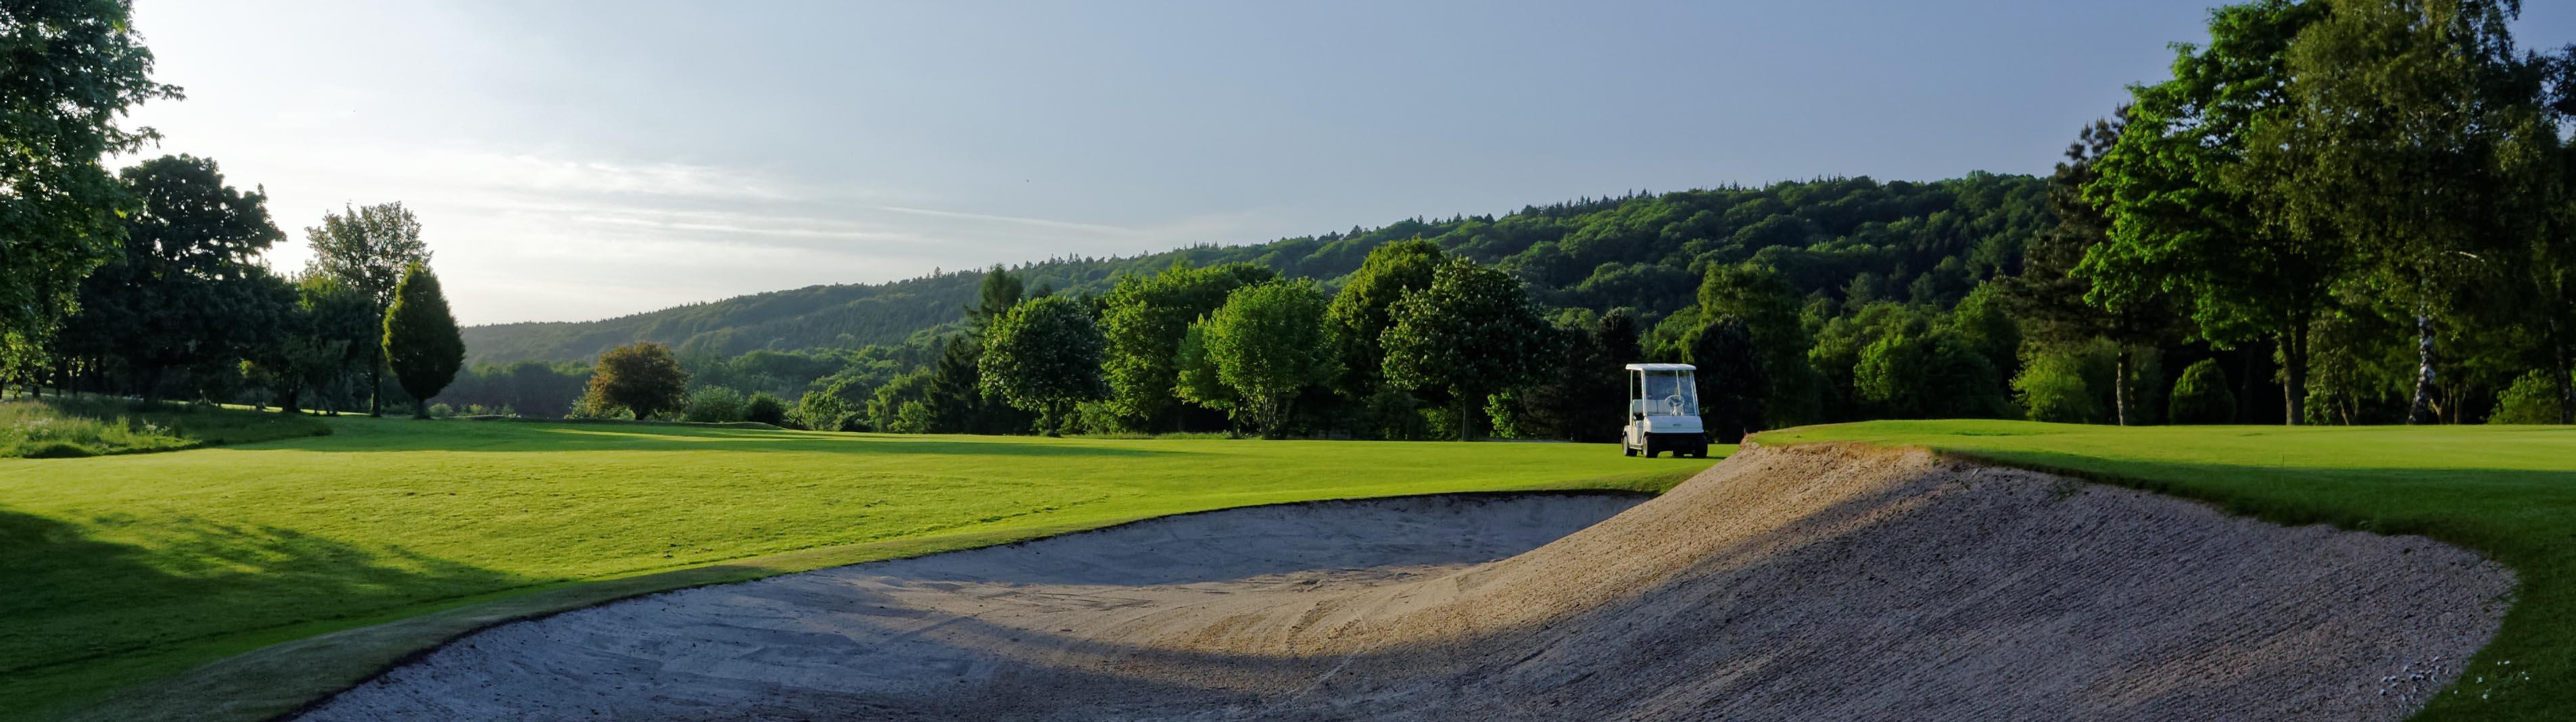 Overview of golf course named Golfclub Tecklenburger Land e.V.